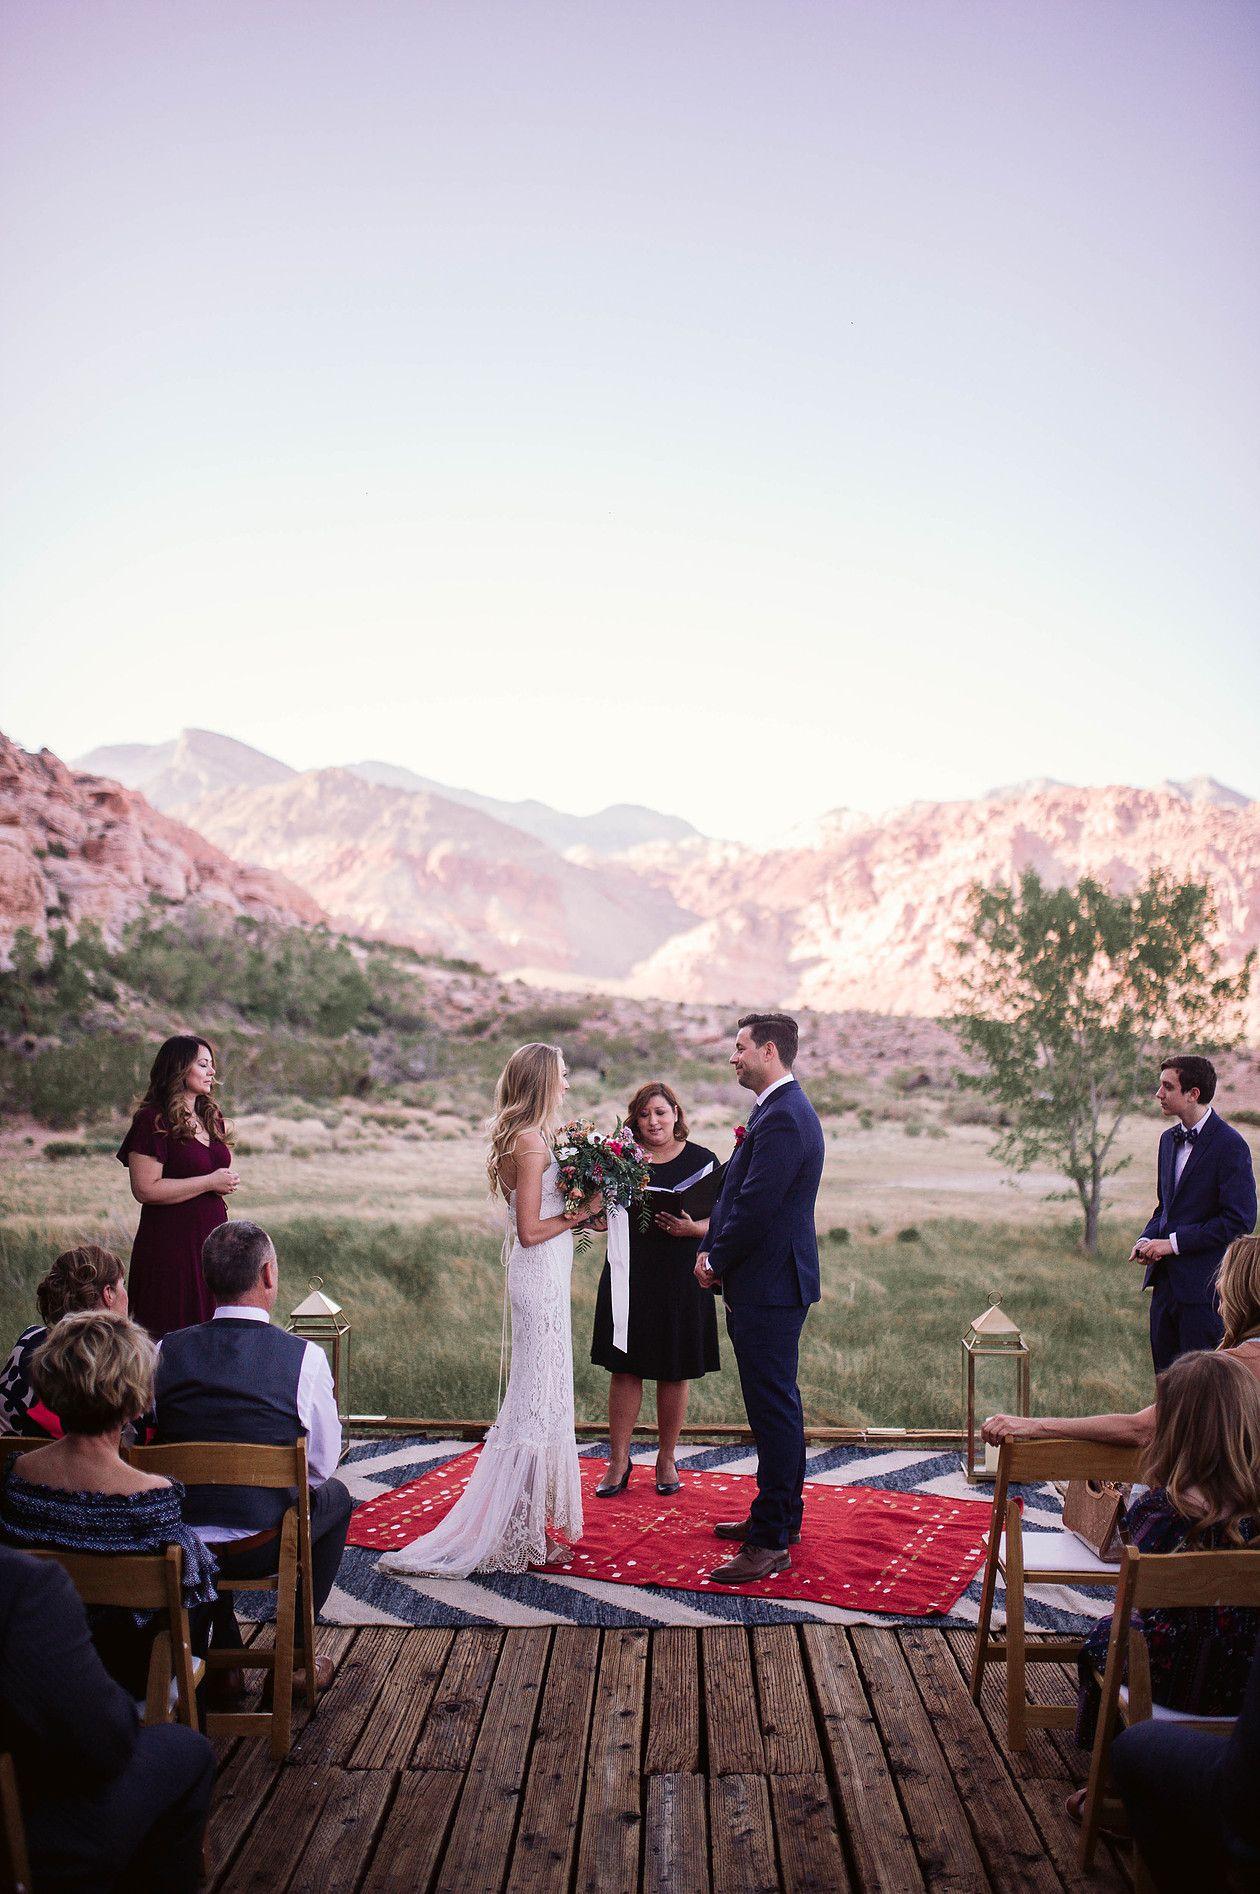 Red Rock Canyon Wedding Las Vegas Elopement Las Vegas Elopement Packages All Incl Las Vegas Elopement Red Rock Wedding Las Vegas Las Vegas Wedding Venue